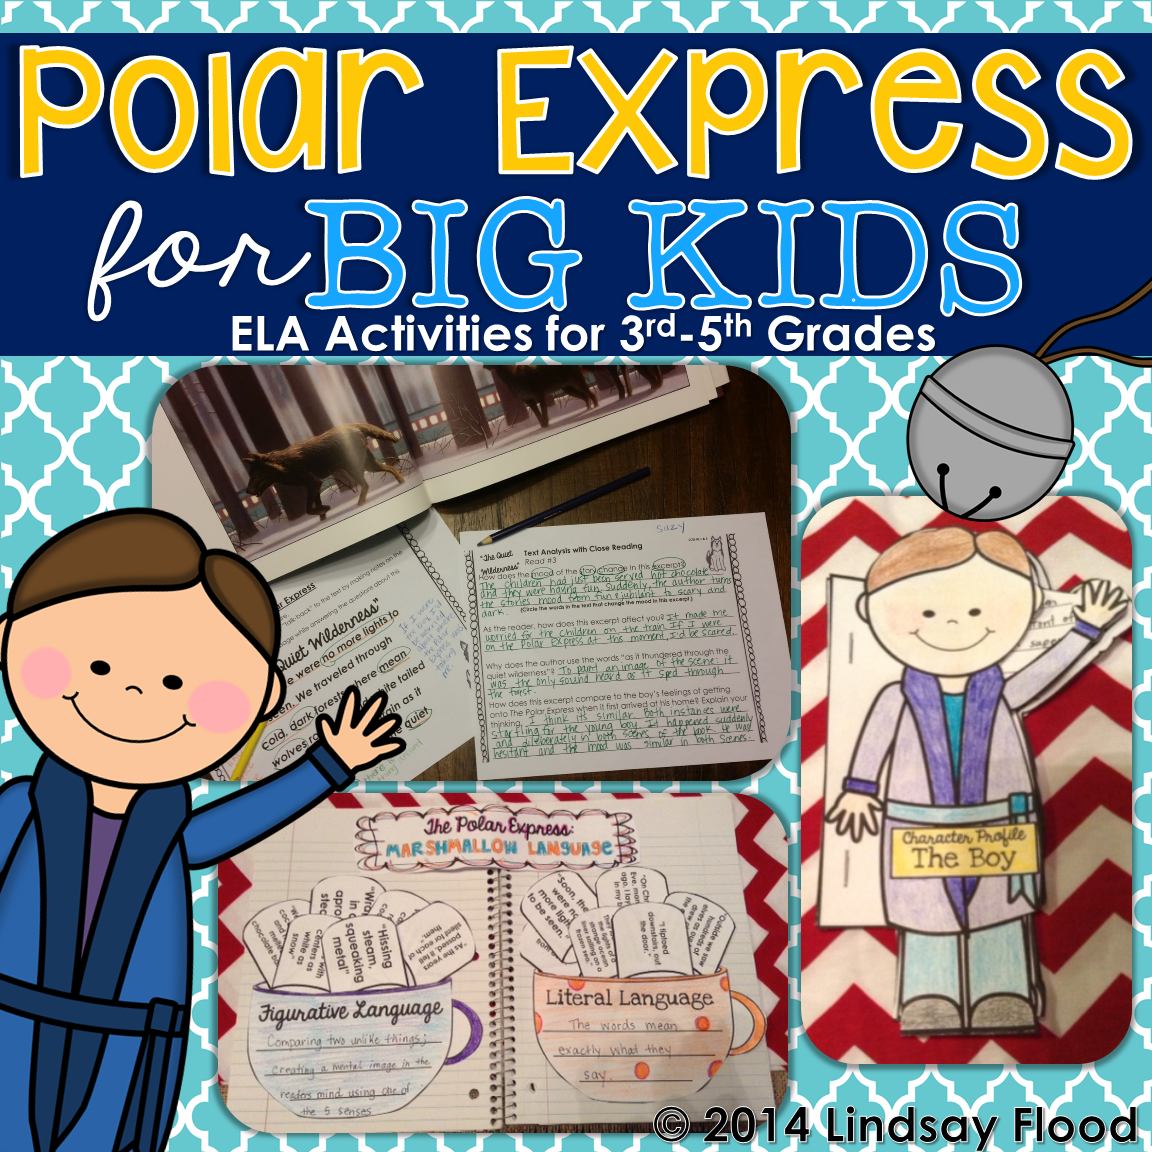 Polar Express For Big Kids